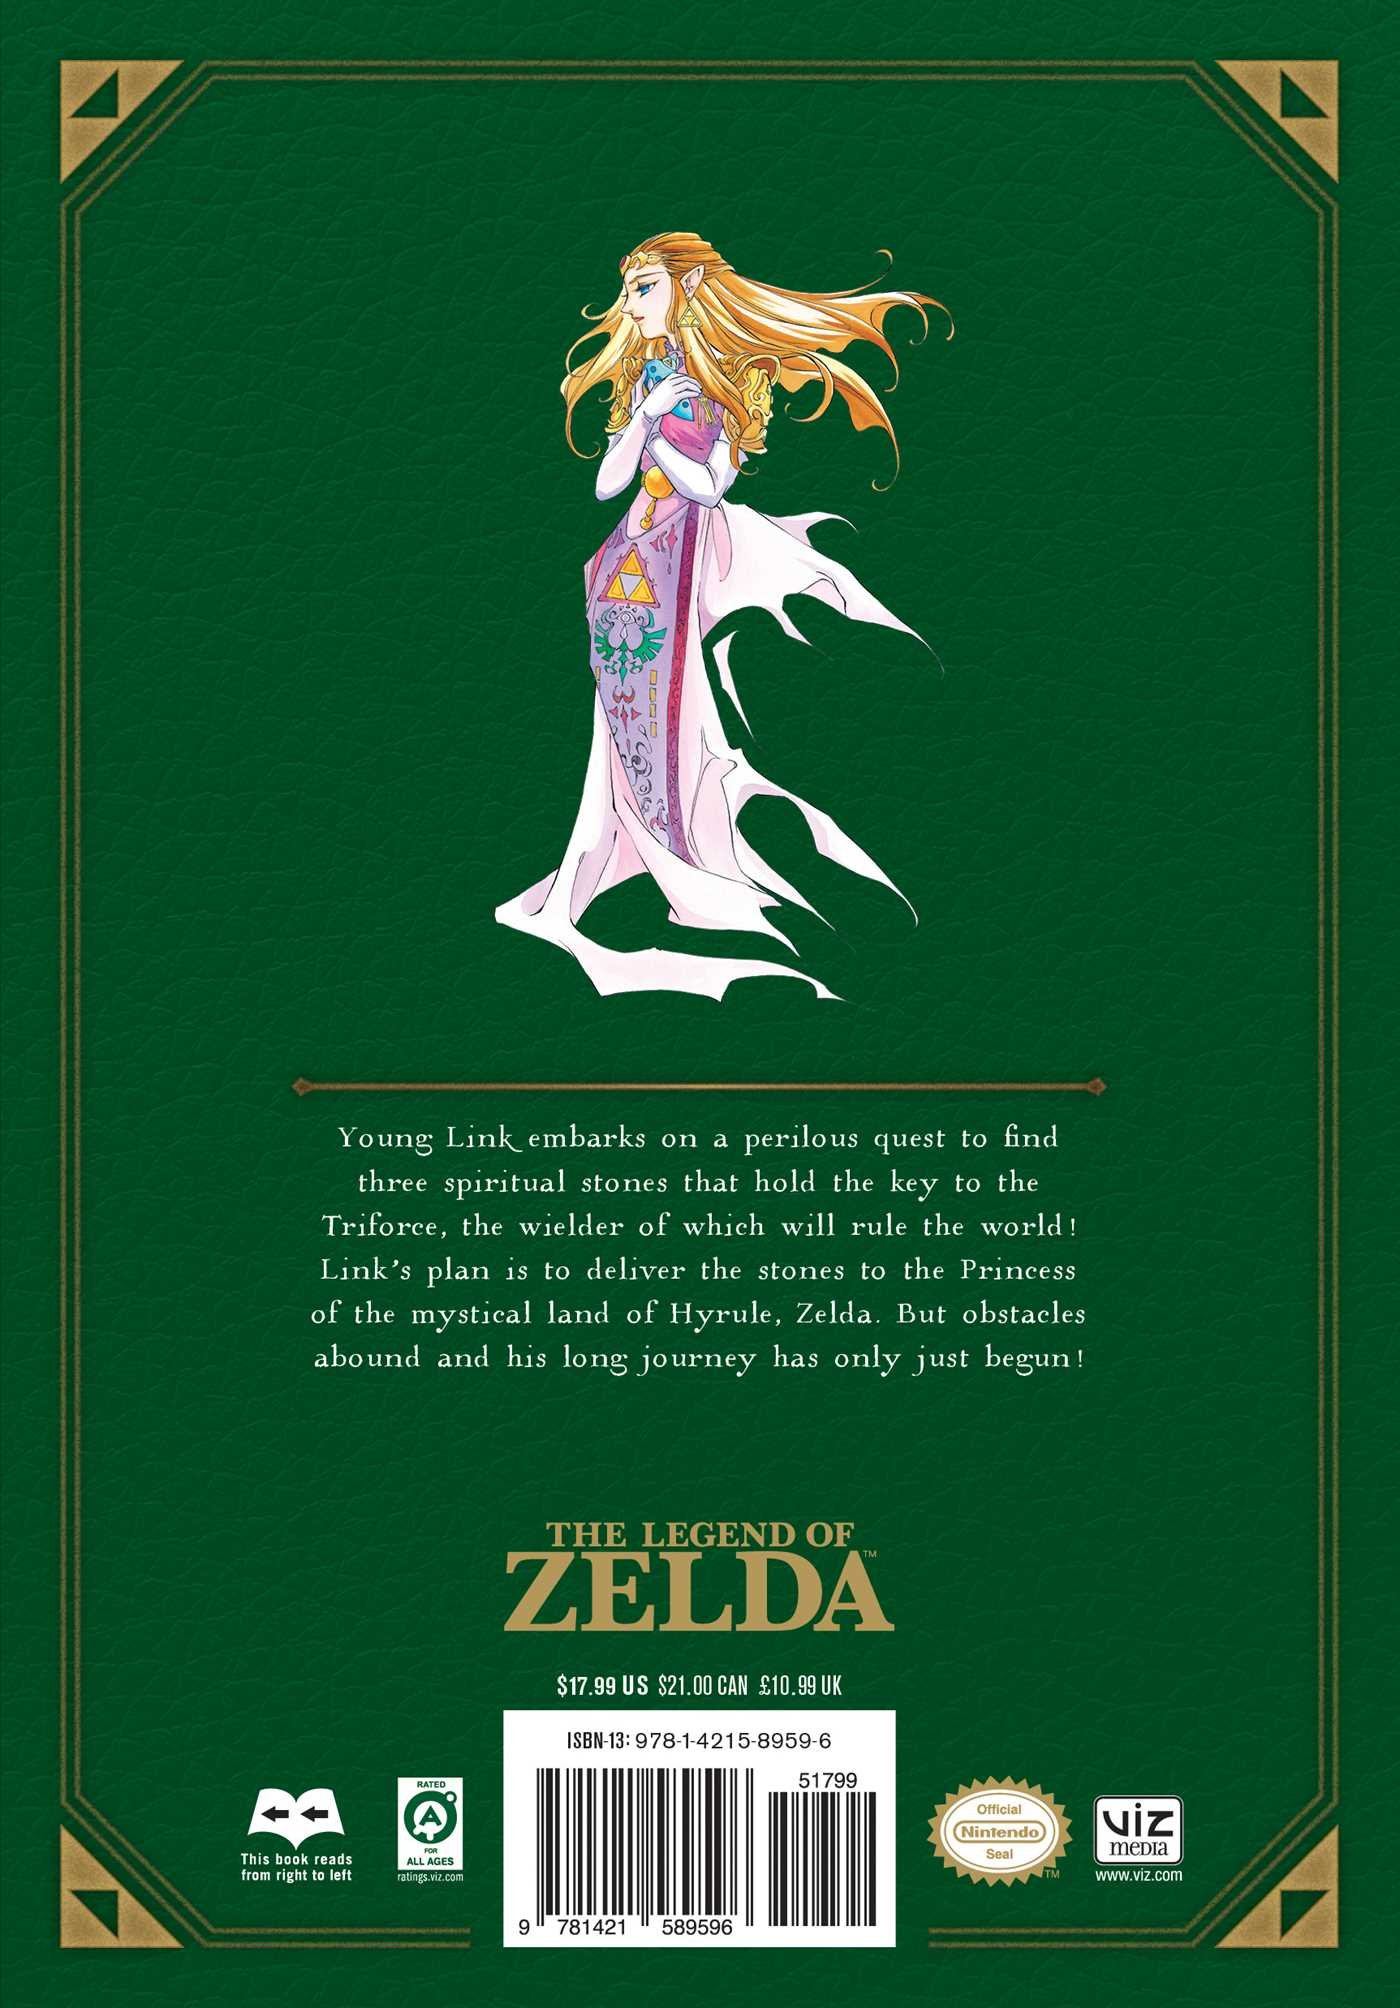 The Legend Of Zelda Ocarina Of Time Legendary Edition The Legend Of Zelda Legendary Edition Himekawa Akira 9781421589596 Amazon Com Books